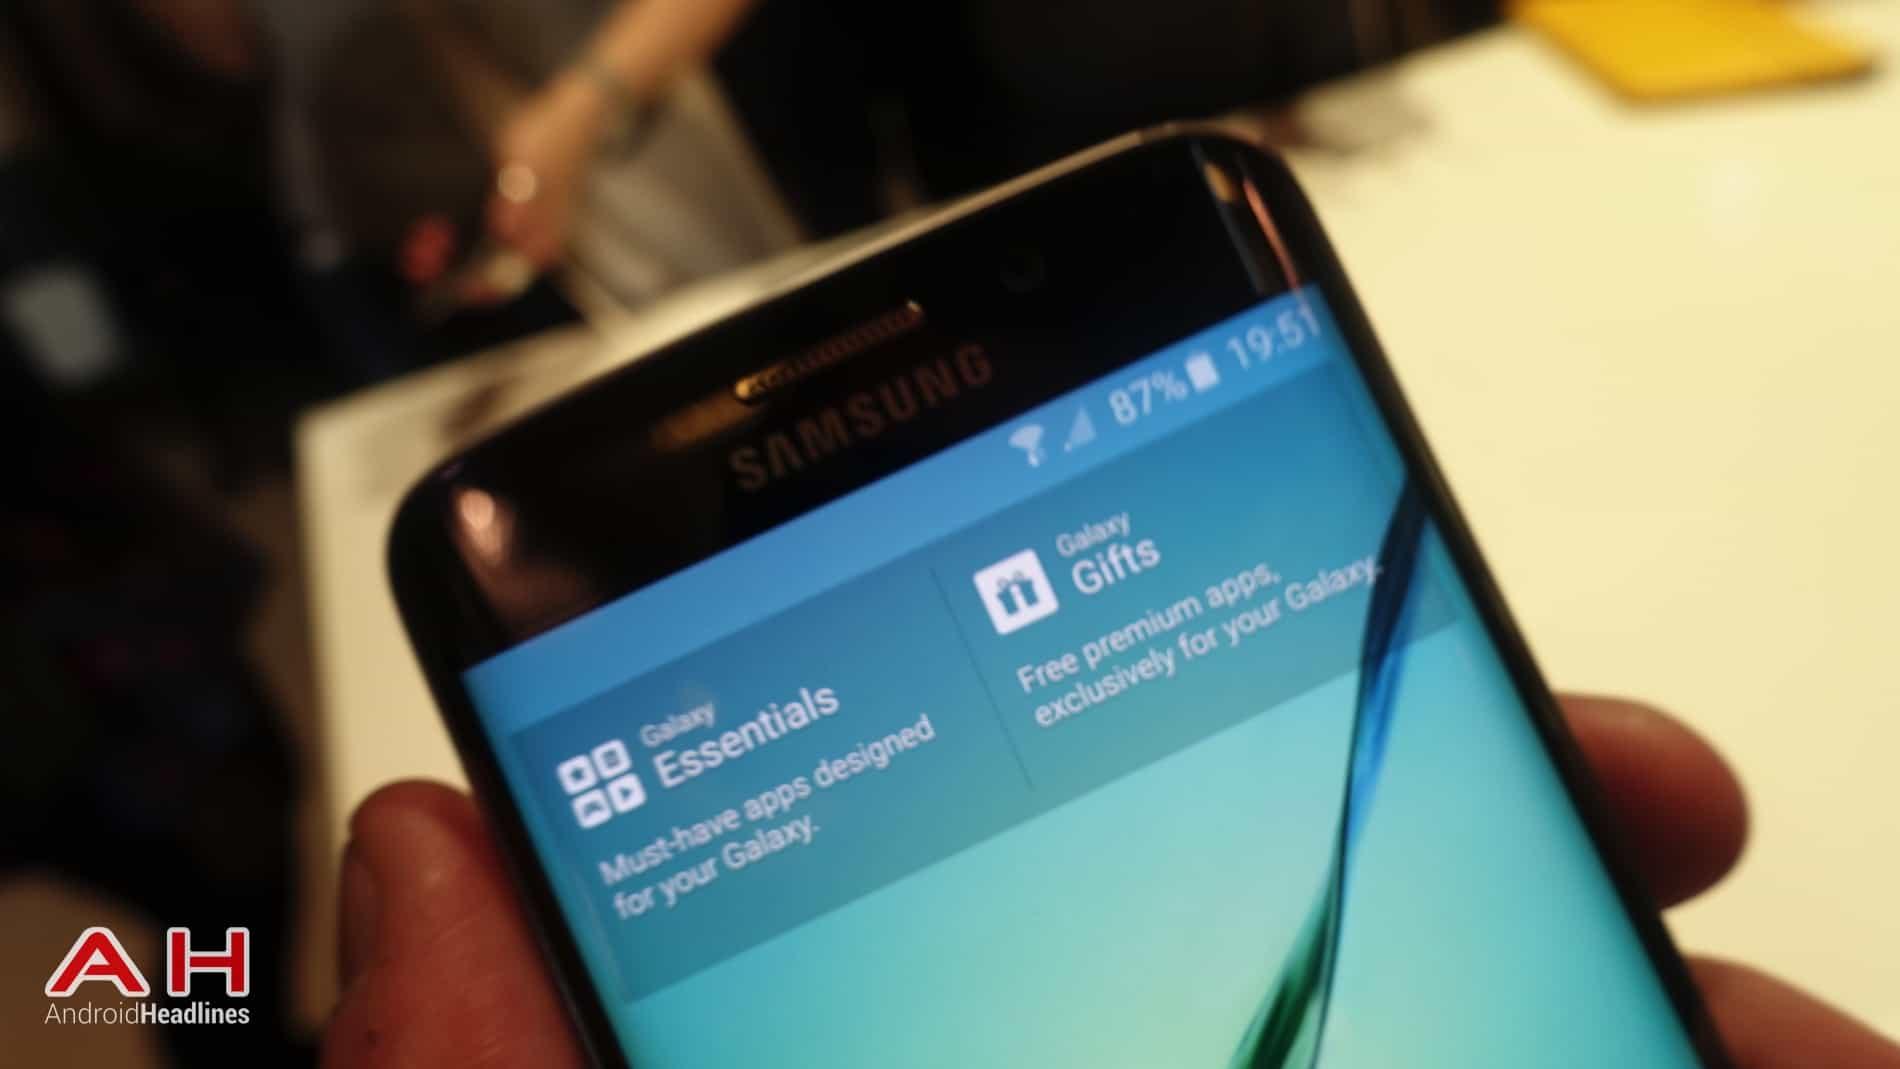 Galaxy S6 S6 Edge Hands On AH 15